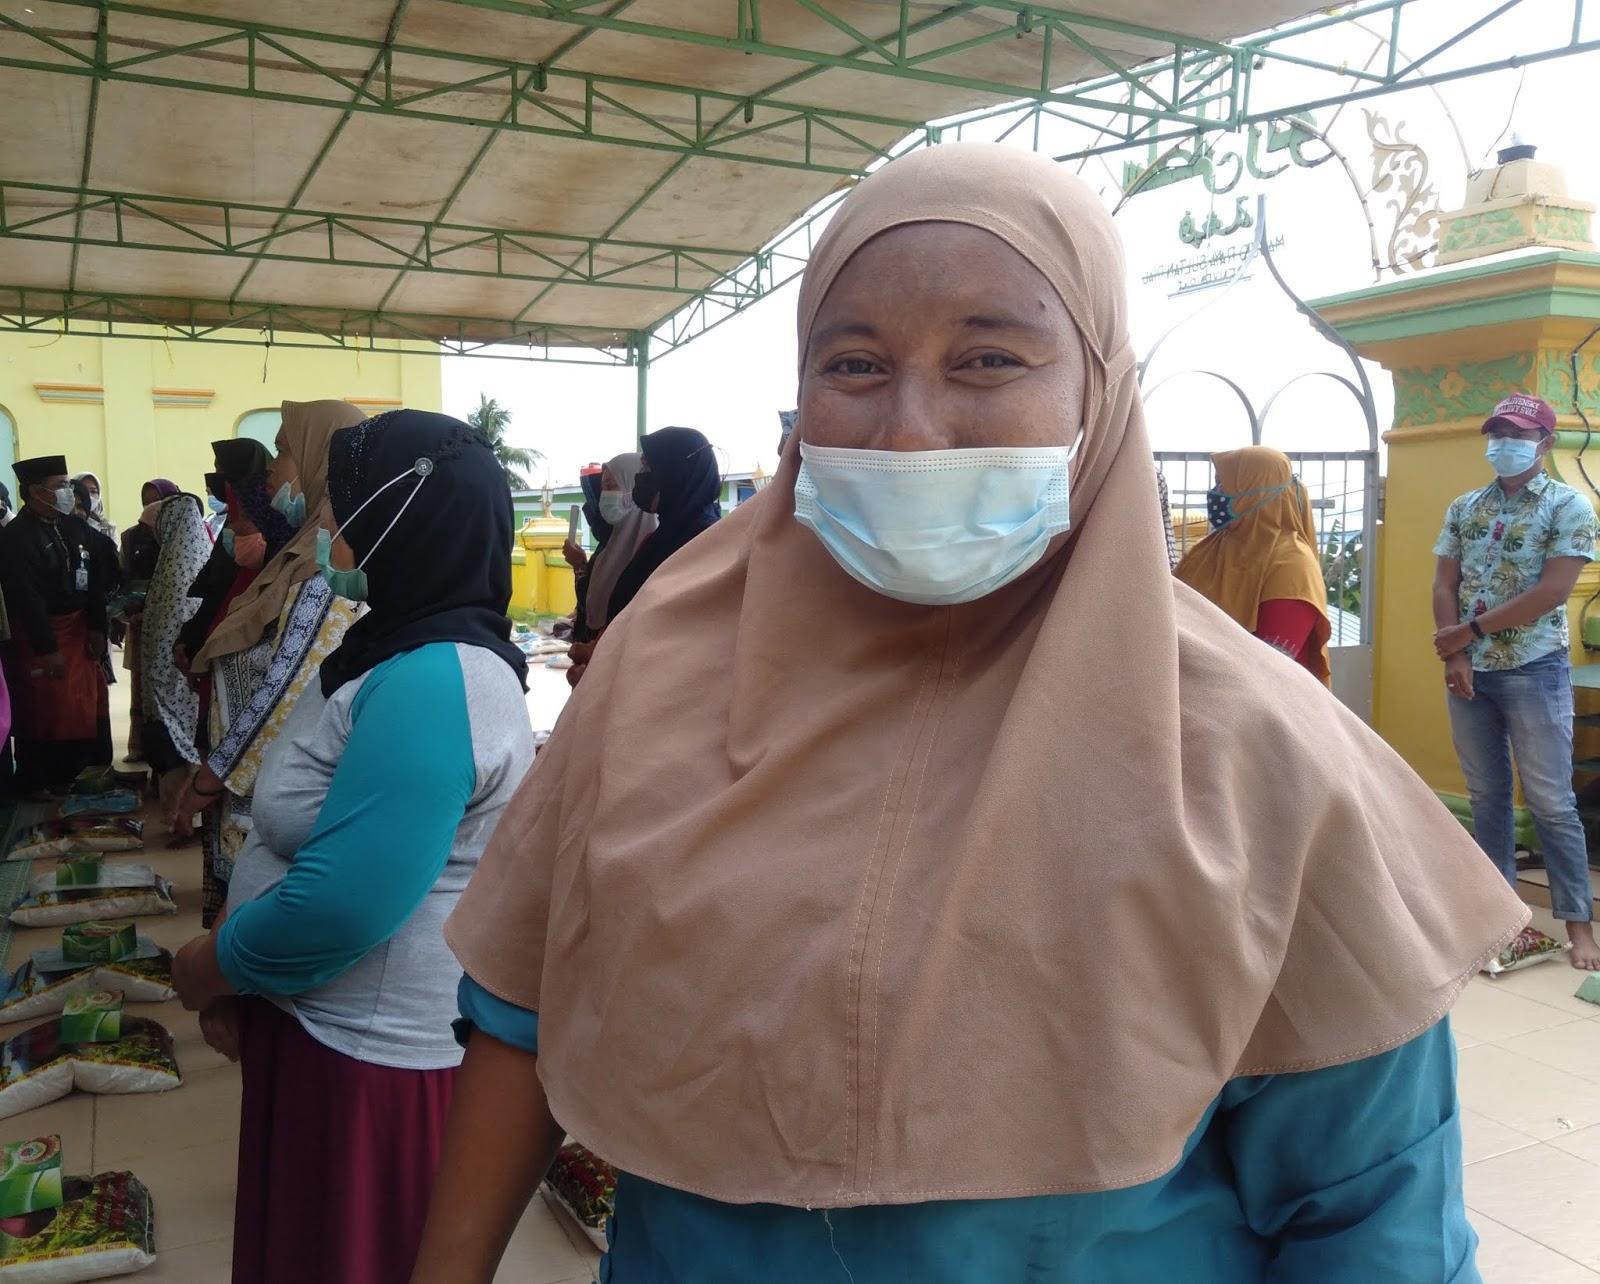 Hadiri Penyaluran Zakat ASN di Pulau Penyengat, Rahma : Air Bersih Akan Dialirkan ke Rumah Warga Dari SWRO